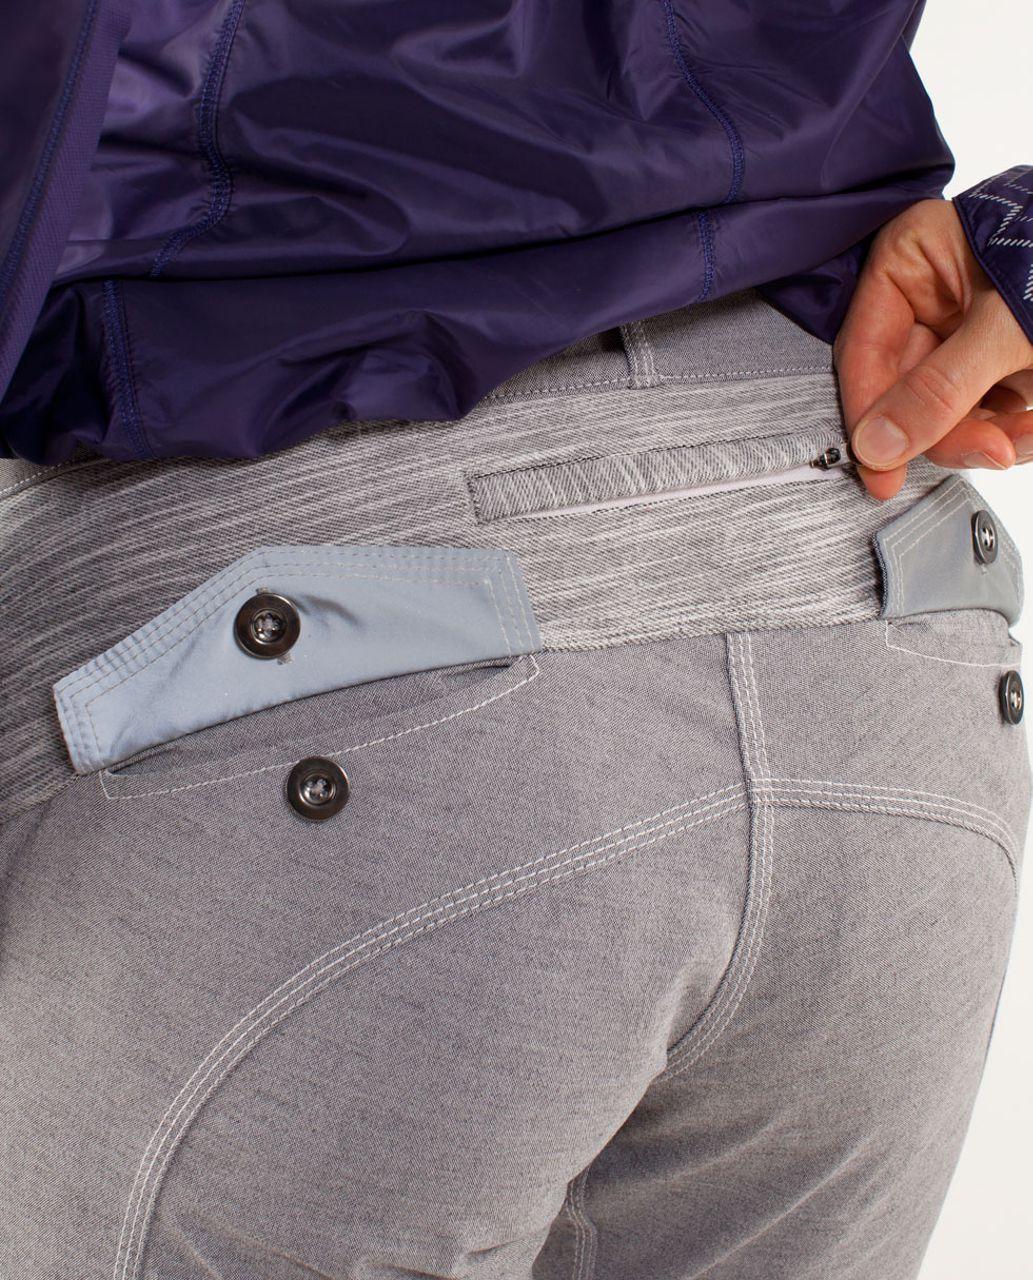 Lululemon Pedal Power Pant - Neutral Blush